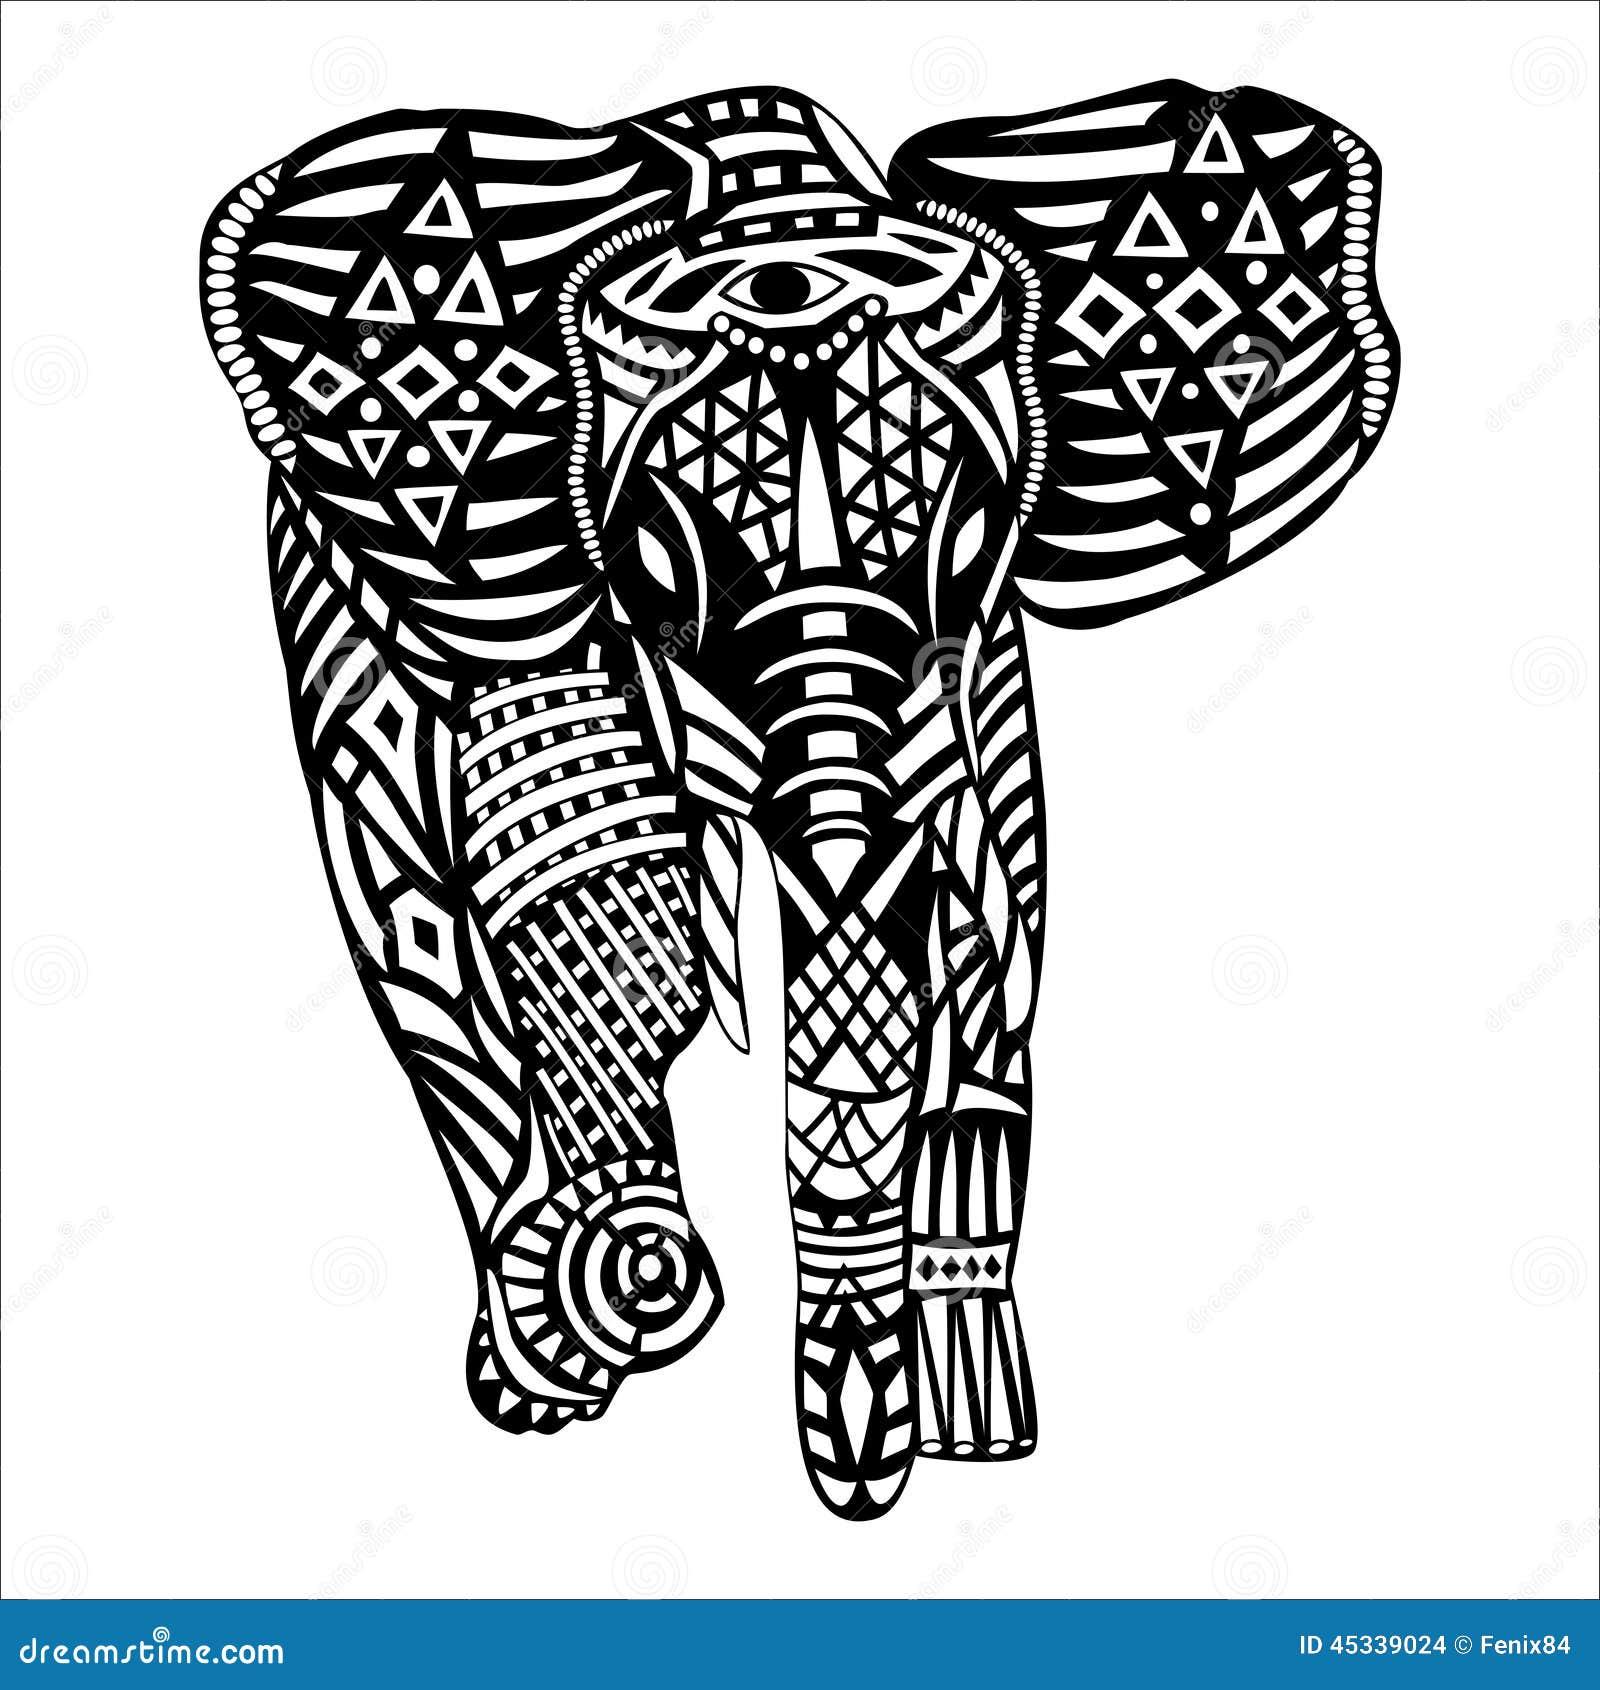 Olifant Kleurplaat Volwassenen Black Elephant With White Patterns On Body Stock Vector